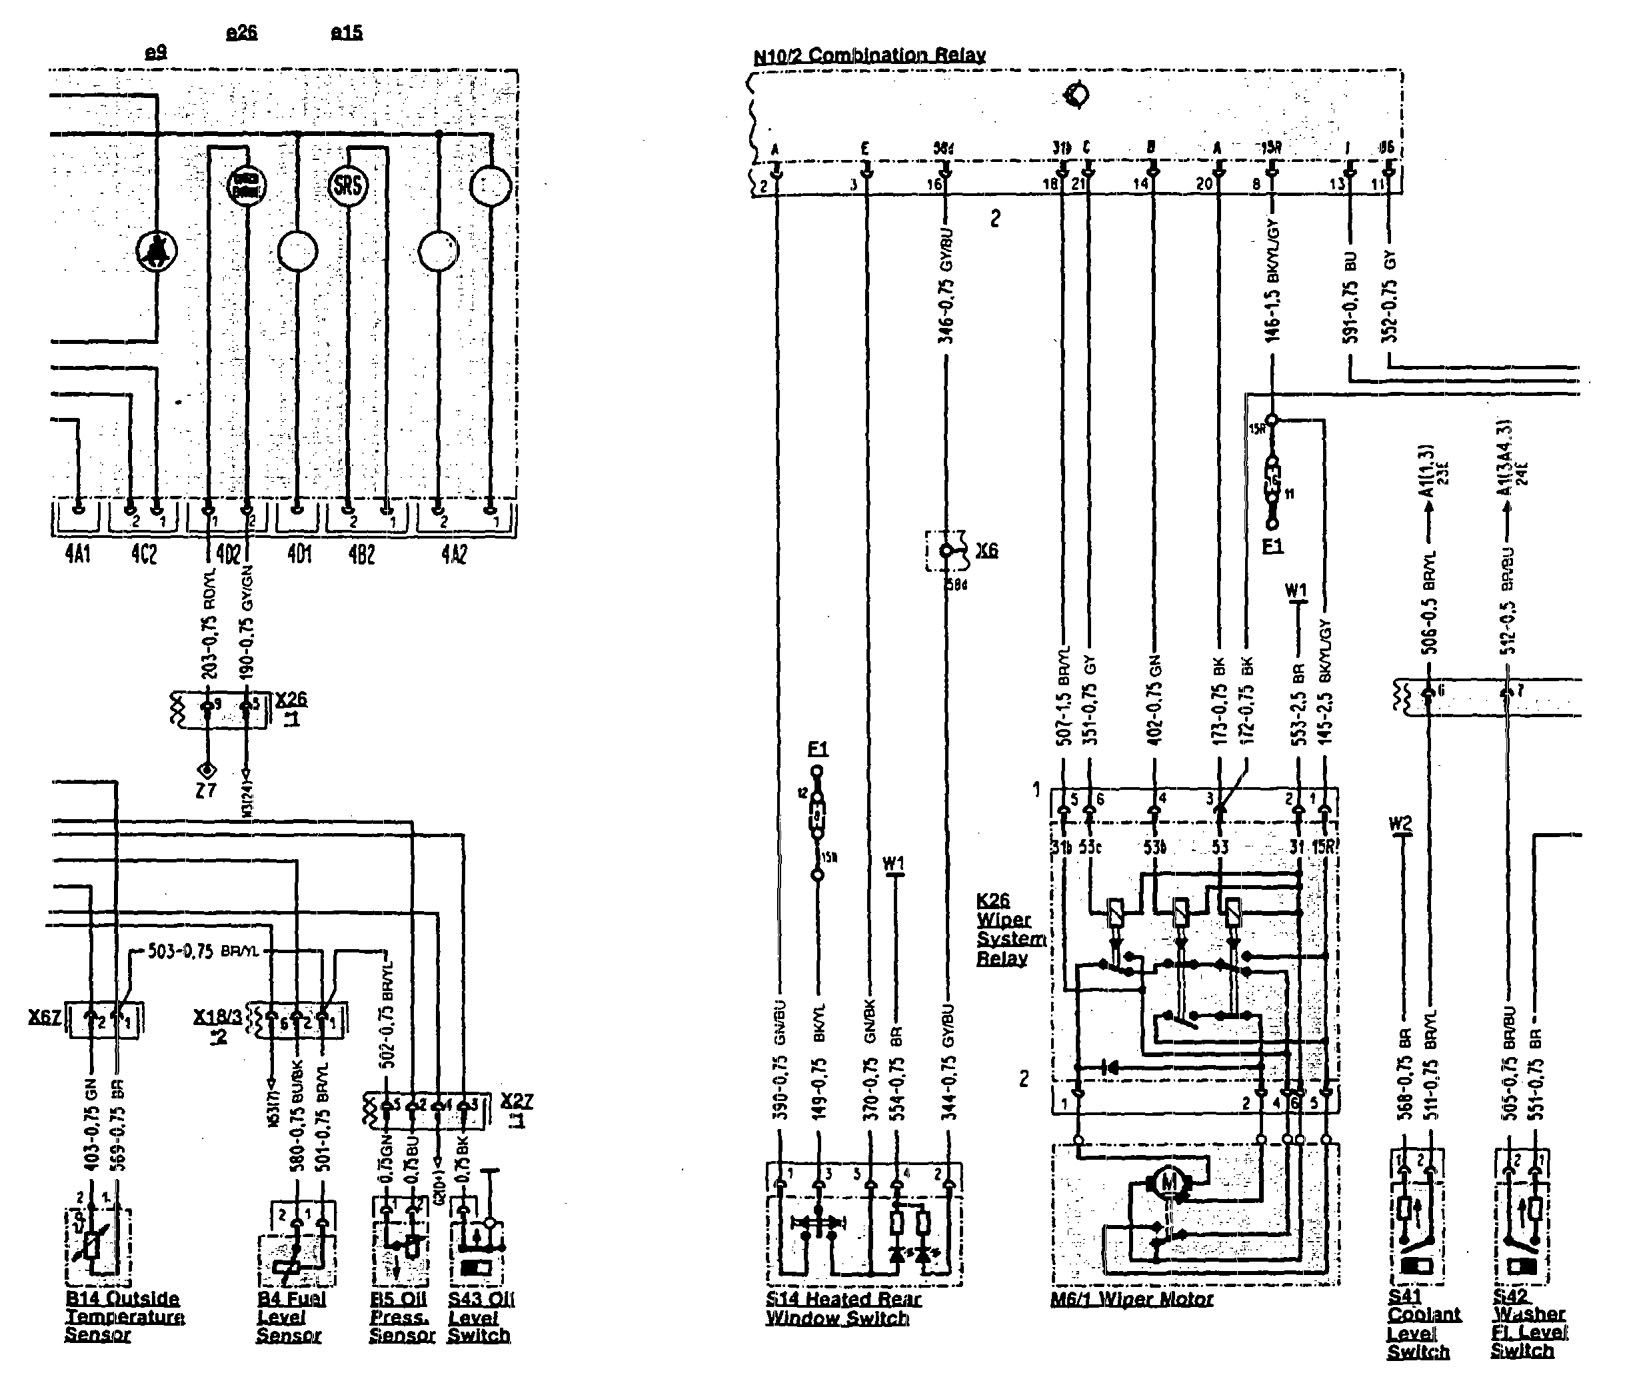 1992 mercedes 500sl wiring diagram for 2001 ford f150 starter solenoid benz 300sl 1990 1993 diagrams